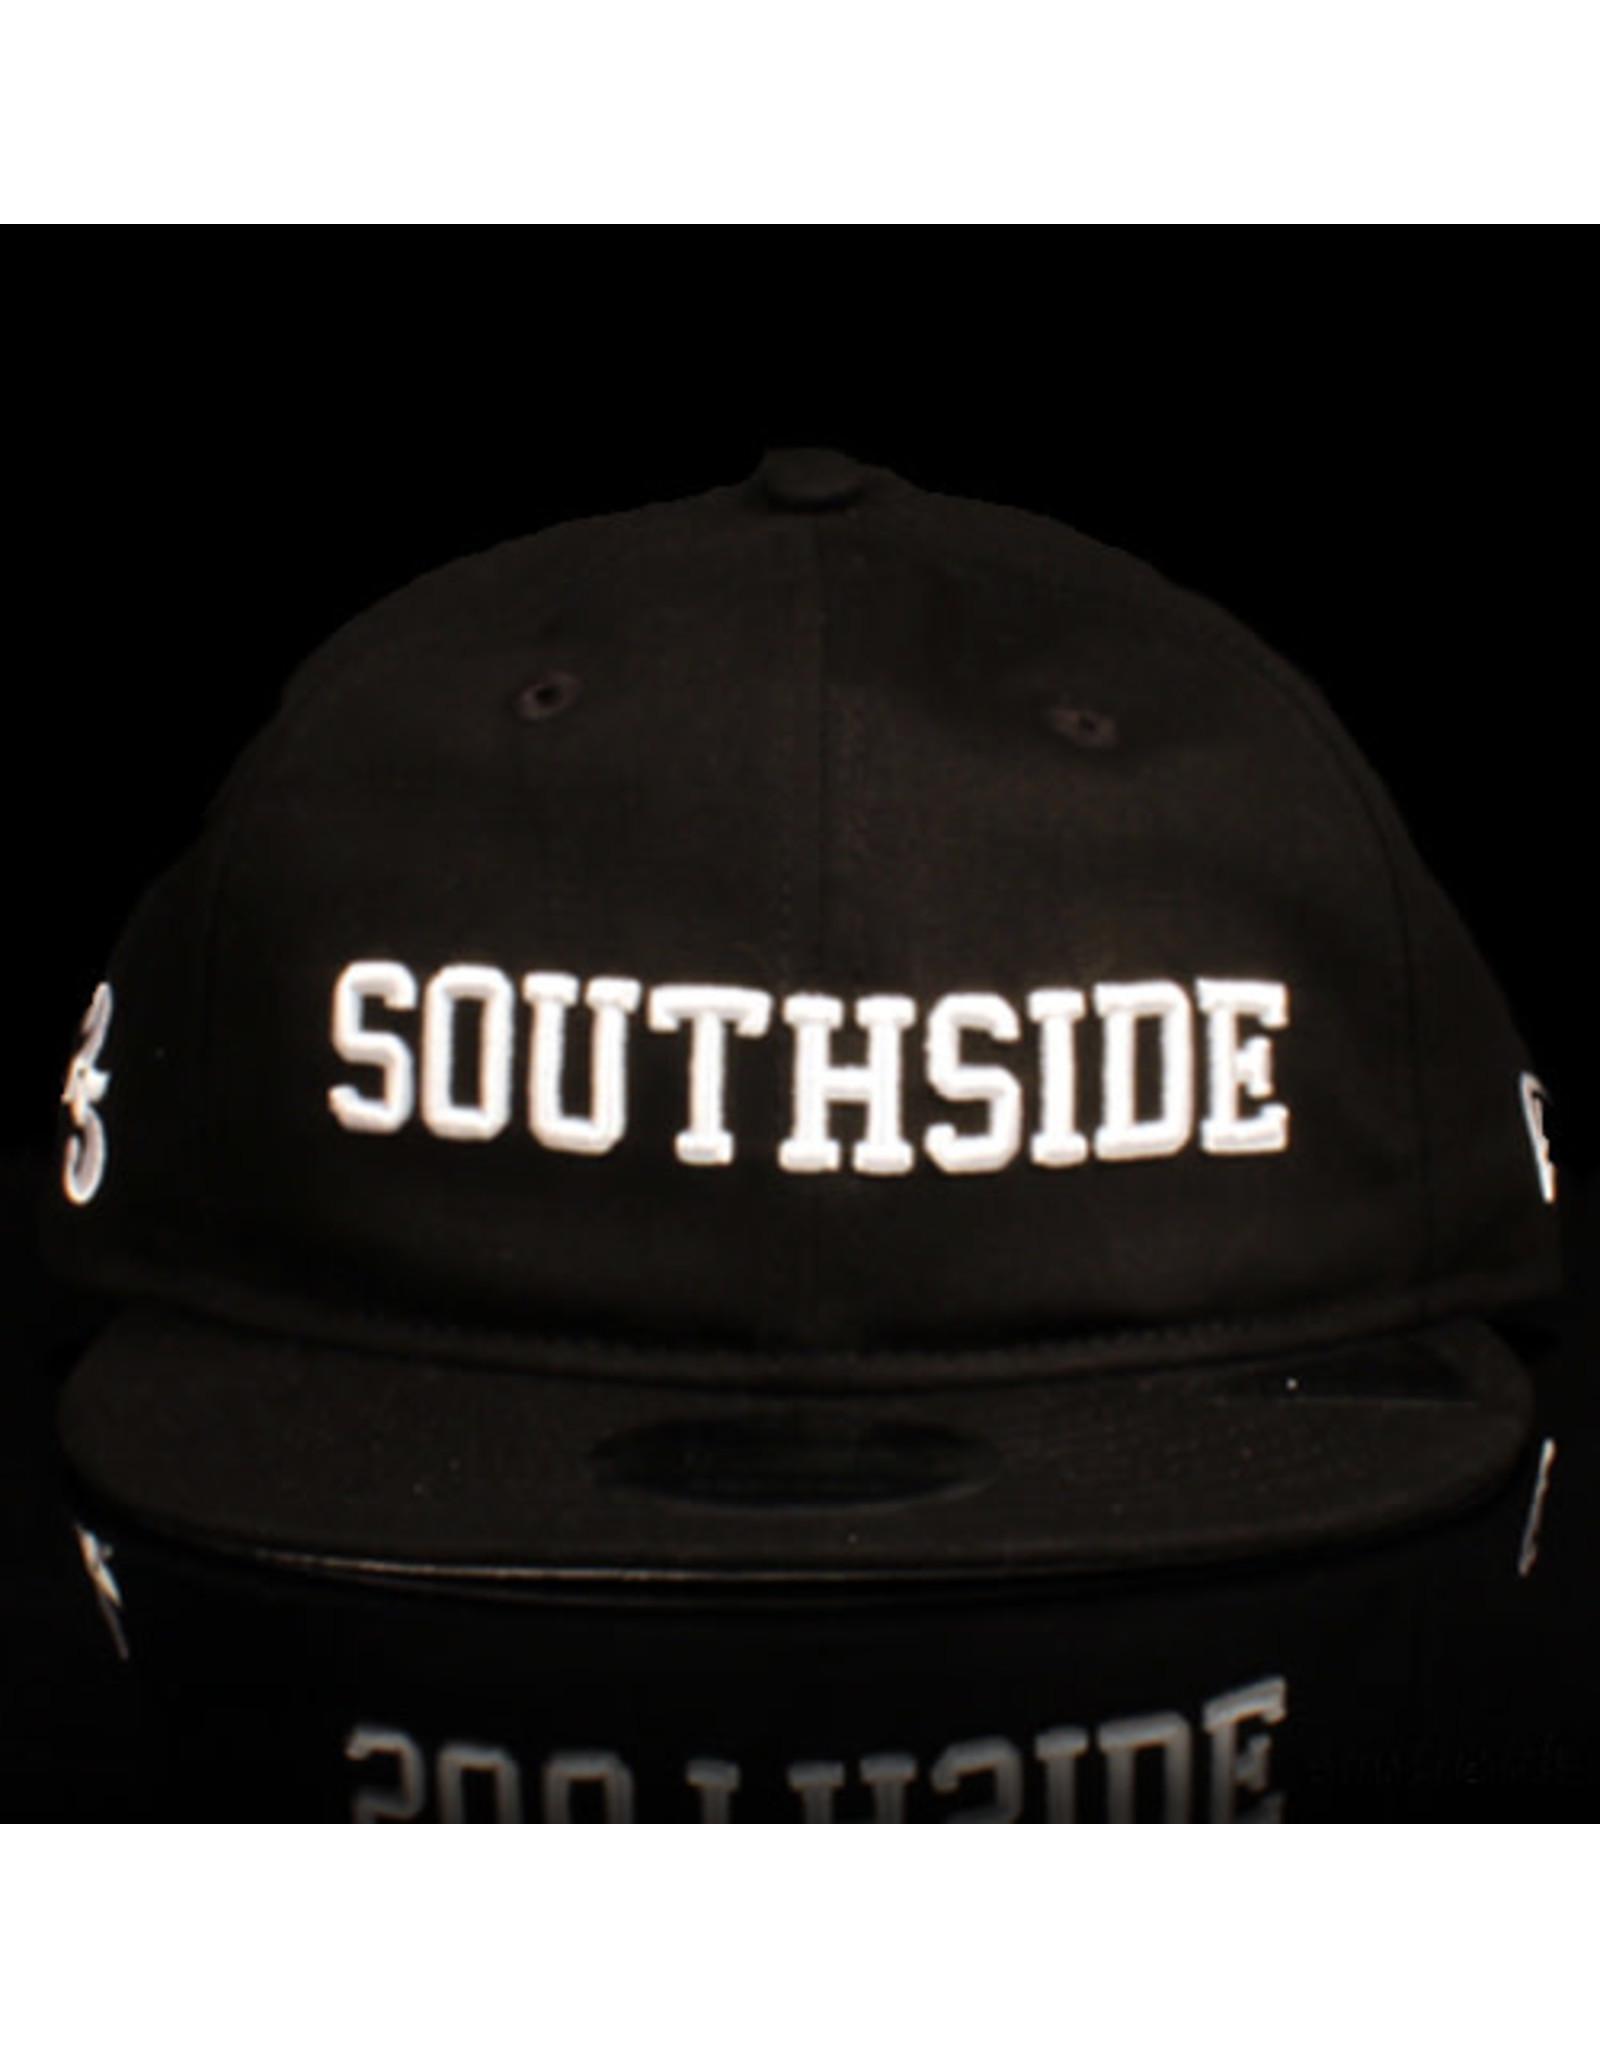 Southside Southside Hat New Era 950 Retro Crown Black White 25 Year Anniversary Snapback